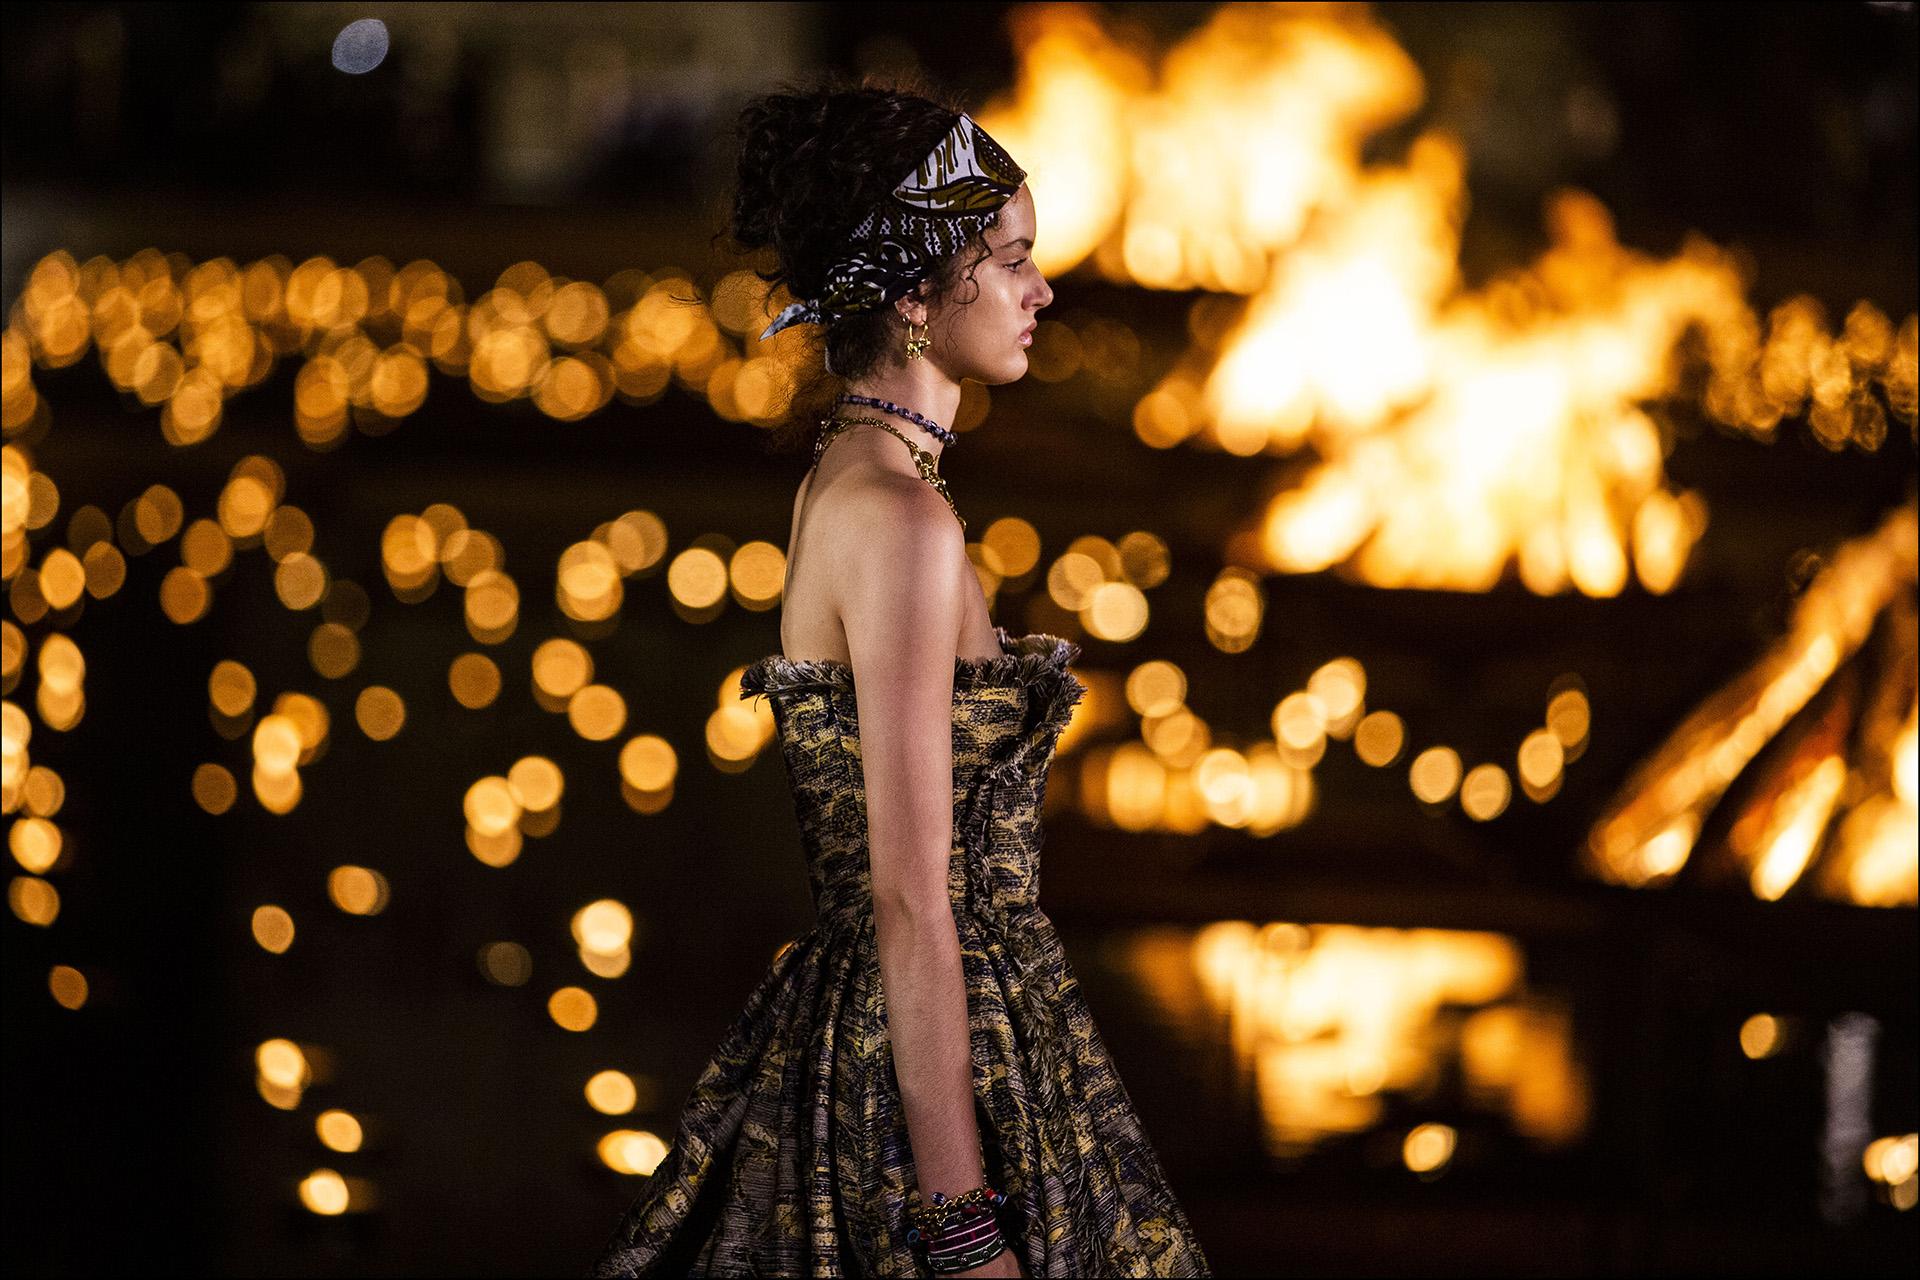 Mannequin - DÈfilÈ CroisiËre Dior au Palais El Badi ‡ Marrakech, le 29 avril 2019. ---- Catwalk - The Christian Dior Couture Cruise Collection in Marrakech, Morocco, on April 29th, 2019.